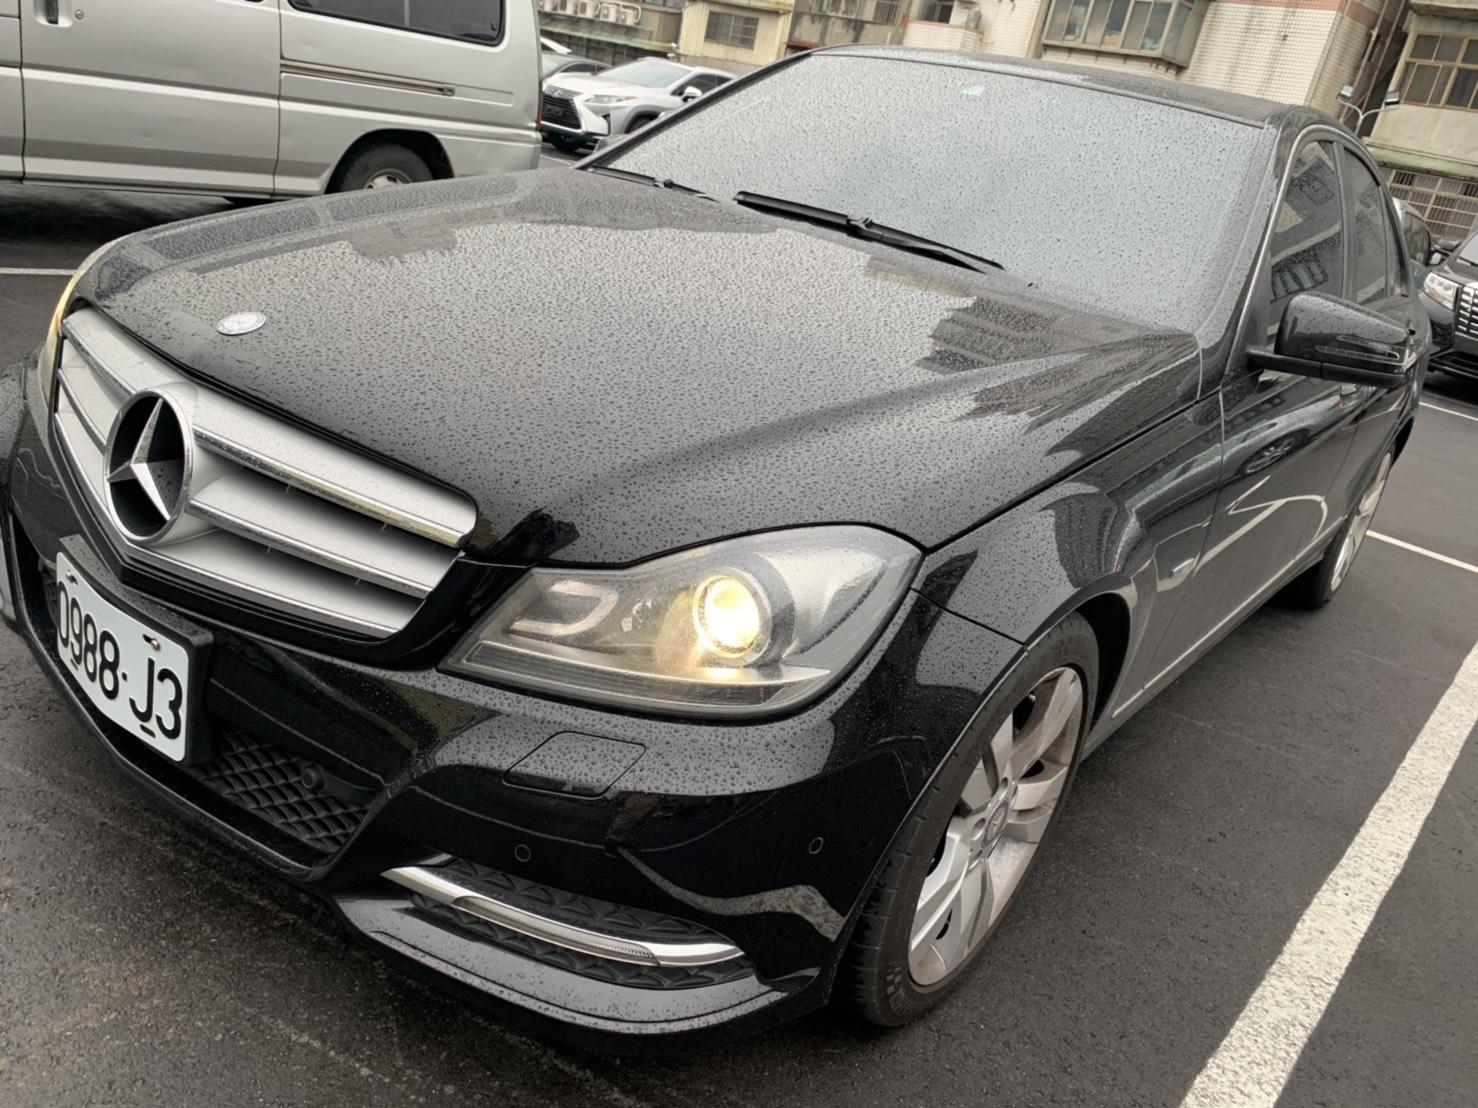 2011 M-Benz 賓士 C-class